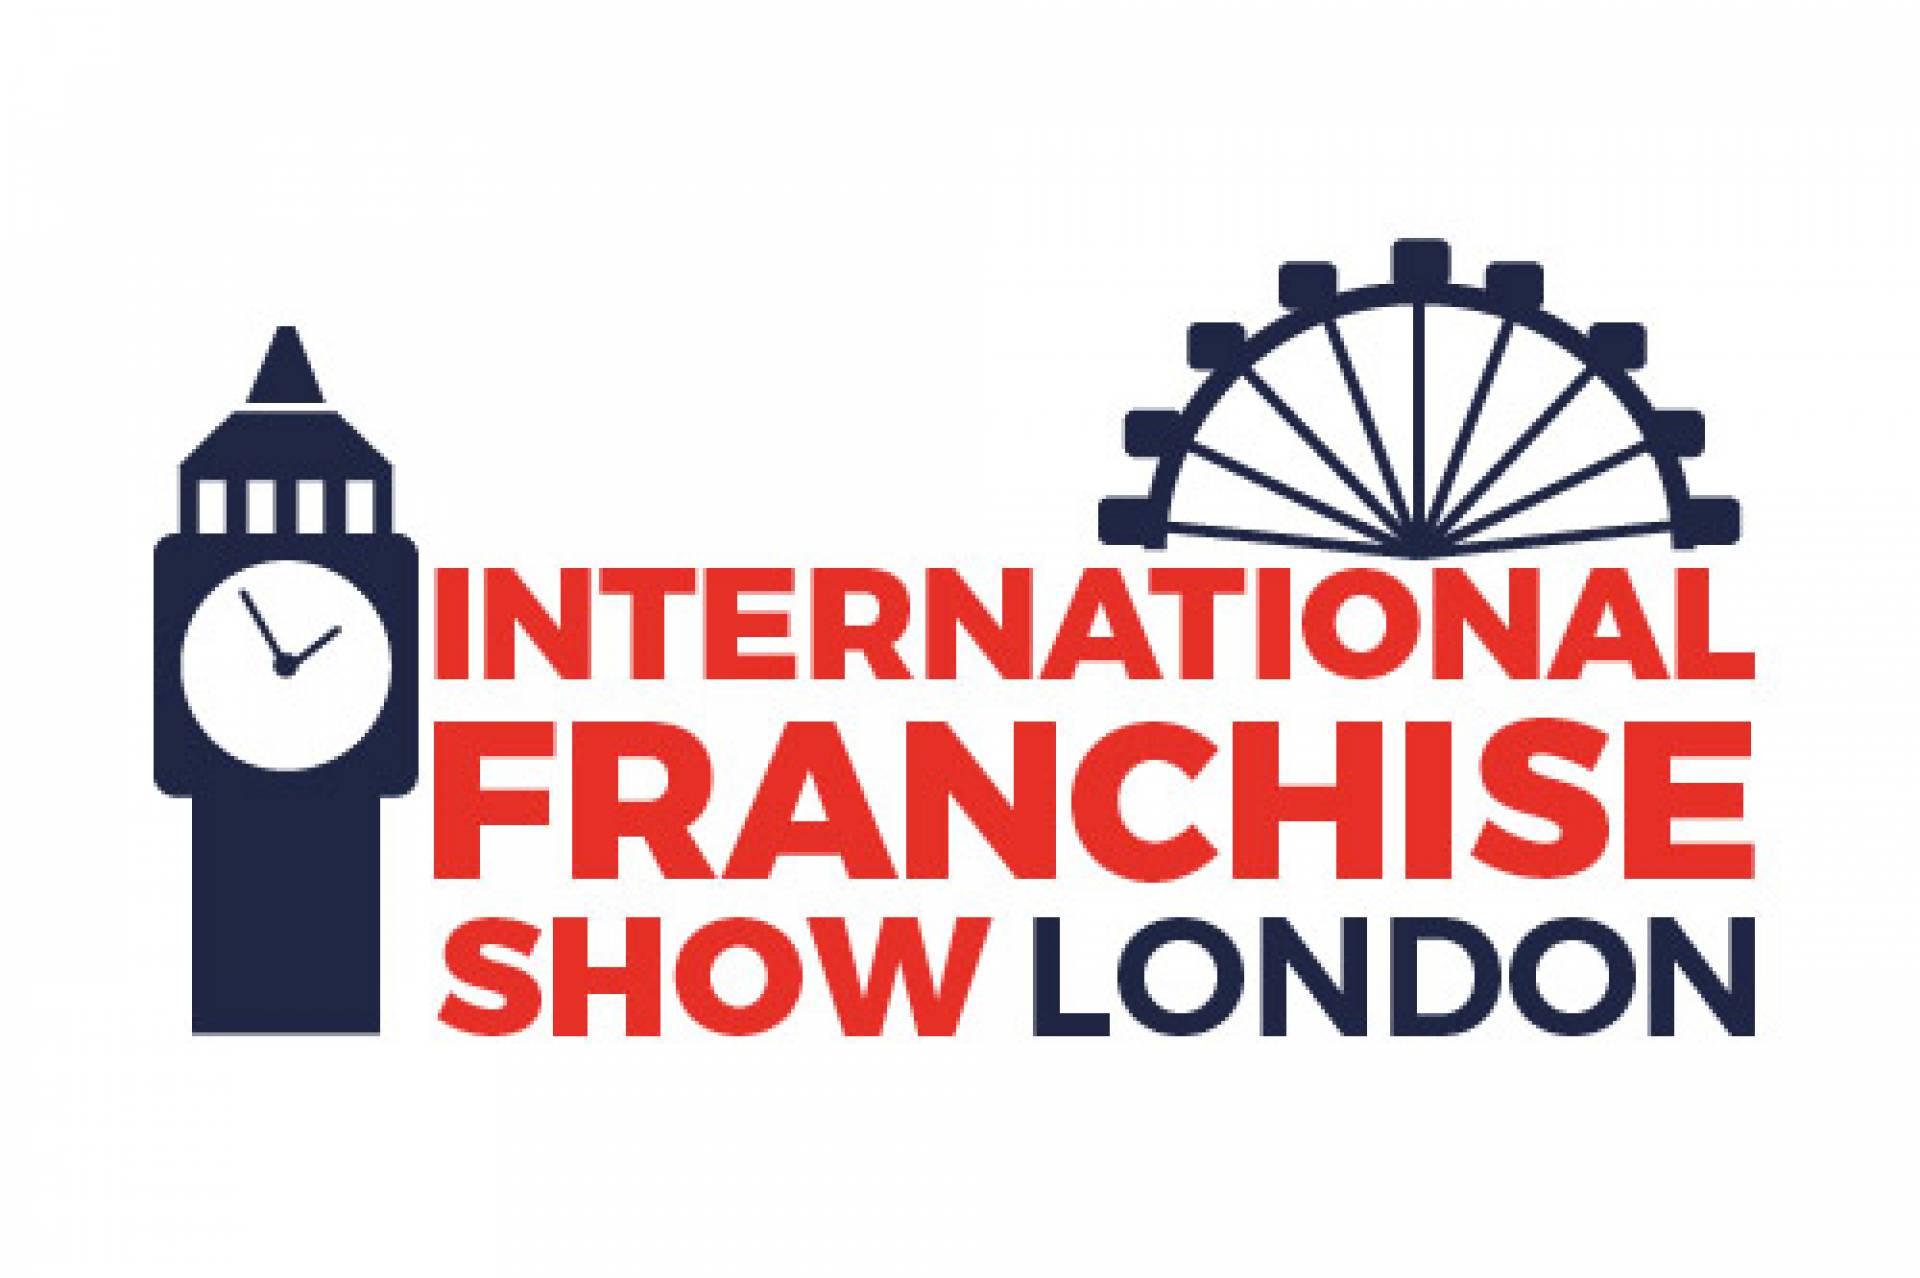 International Franchise Show London